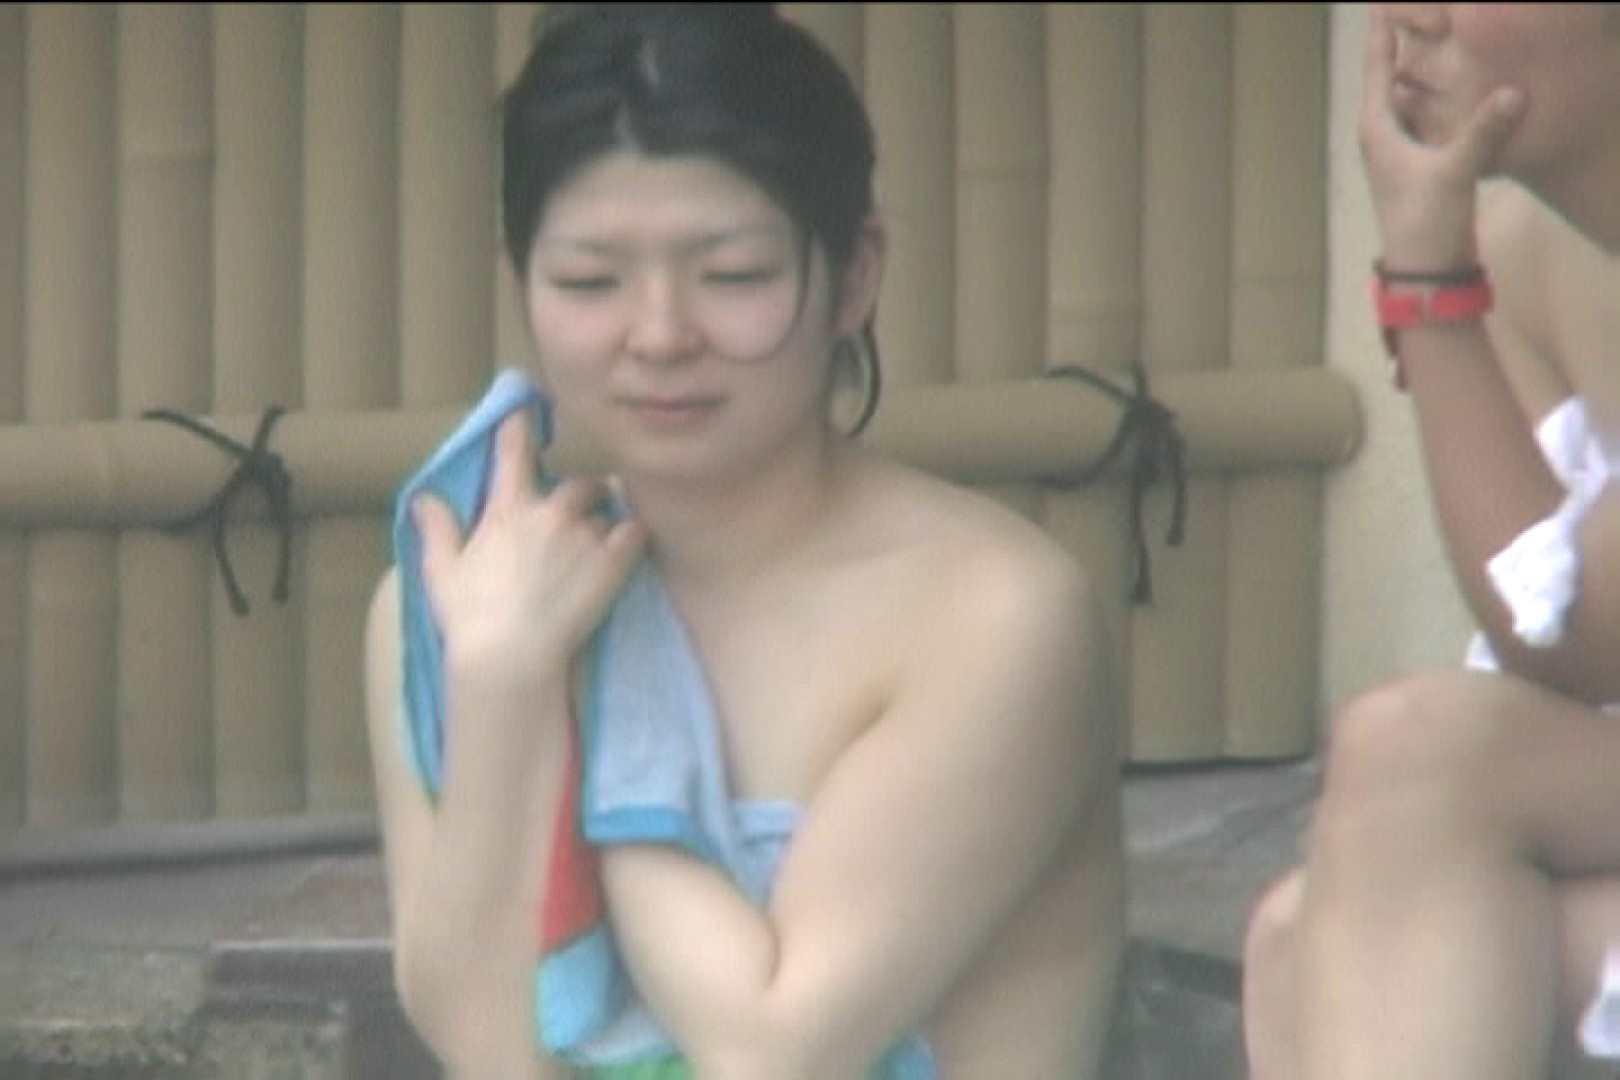 Aquaな露天風呂Vol.139 盗撮シリーズ | 露天風呂編  79PIX 77